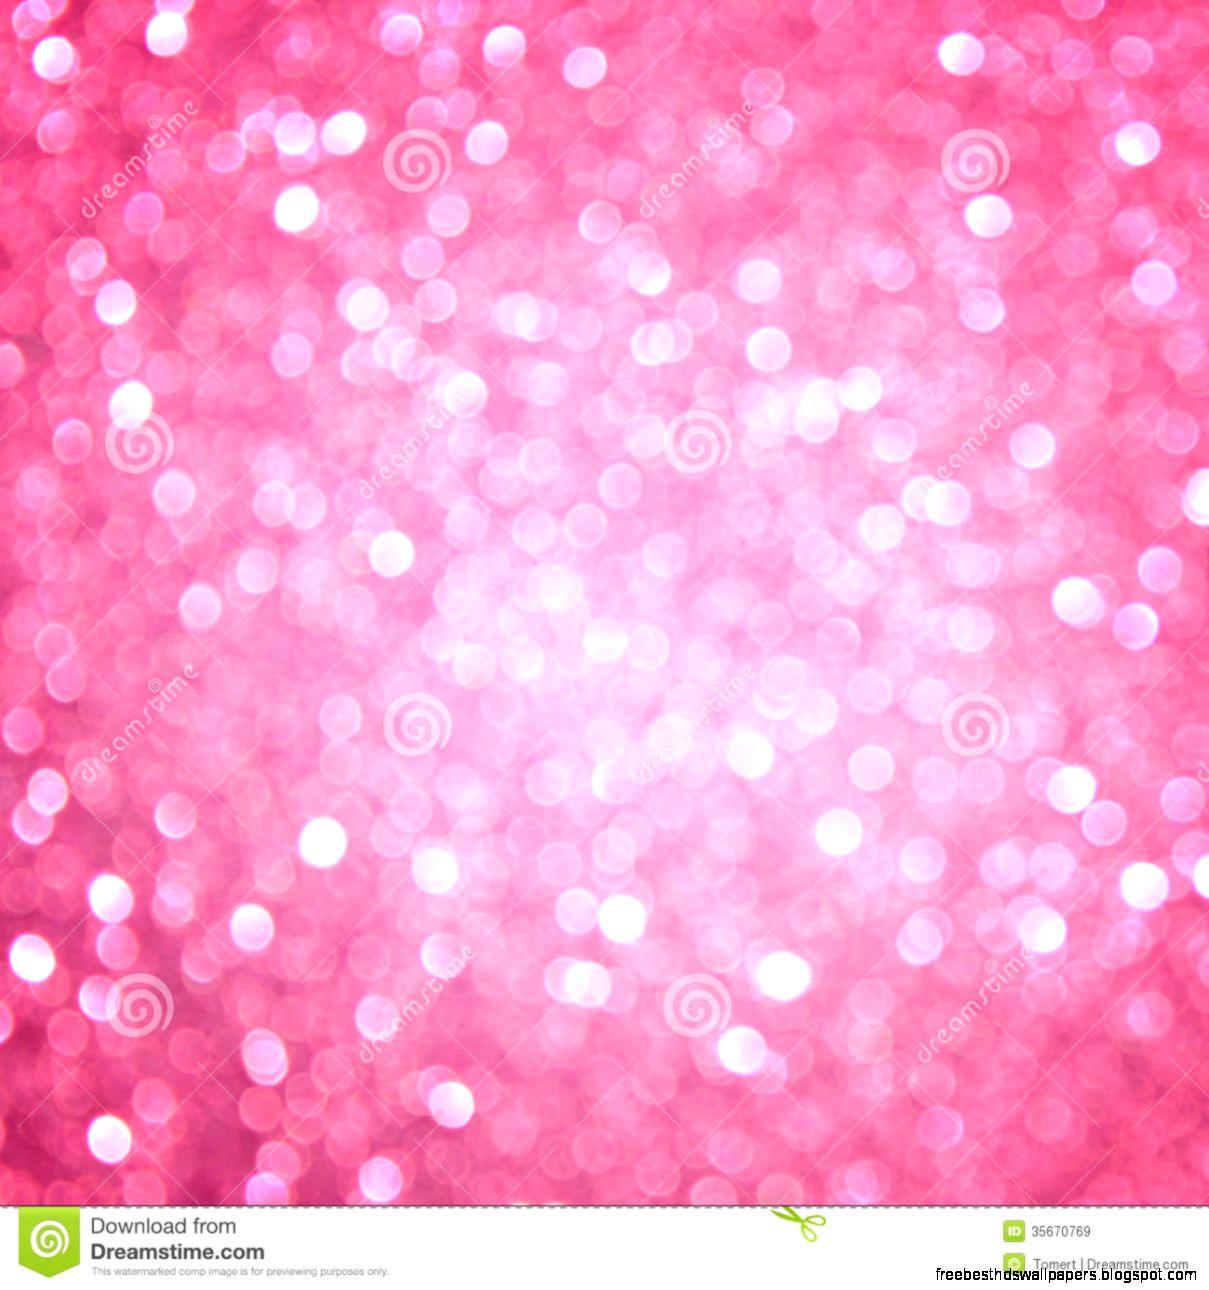 Light Pink Sparkle Background Wallpaper Best Hd Wallpapers 1209x1290